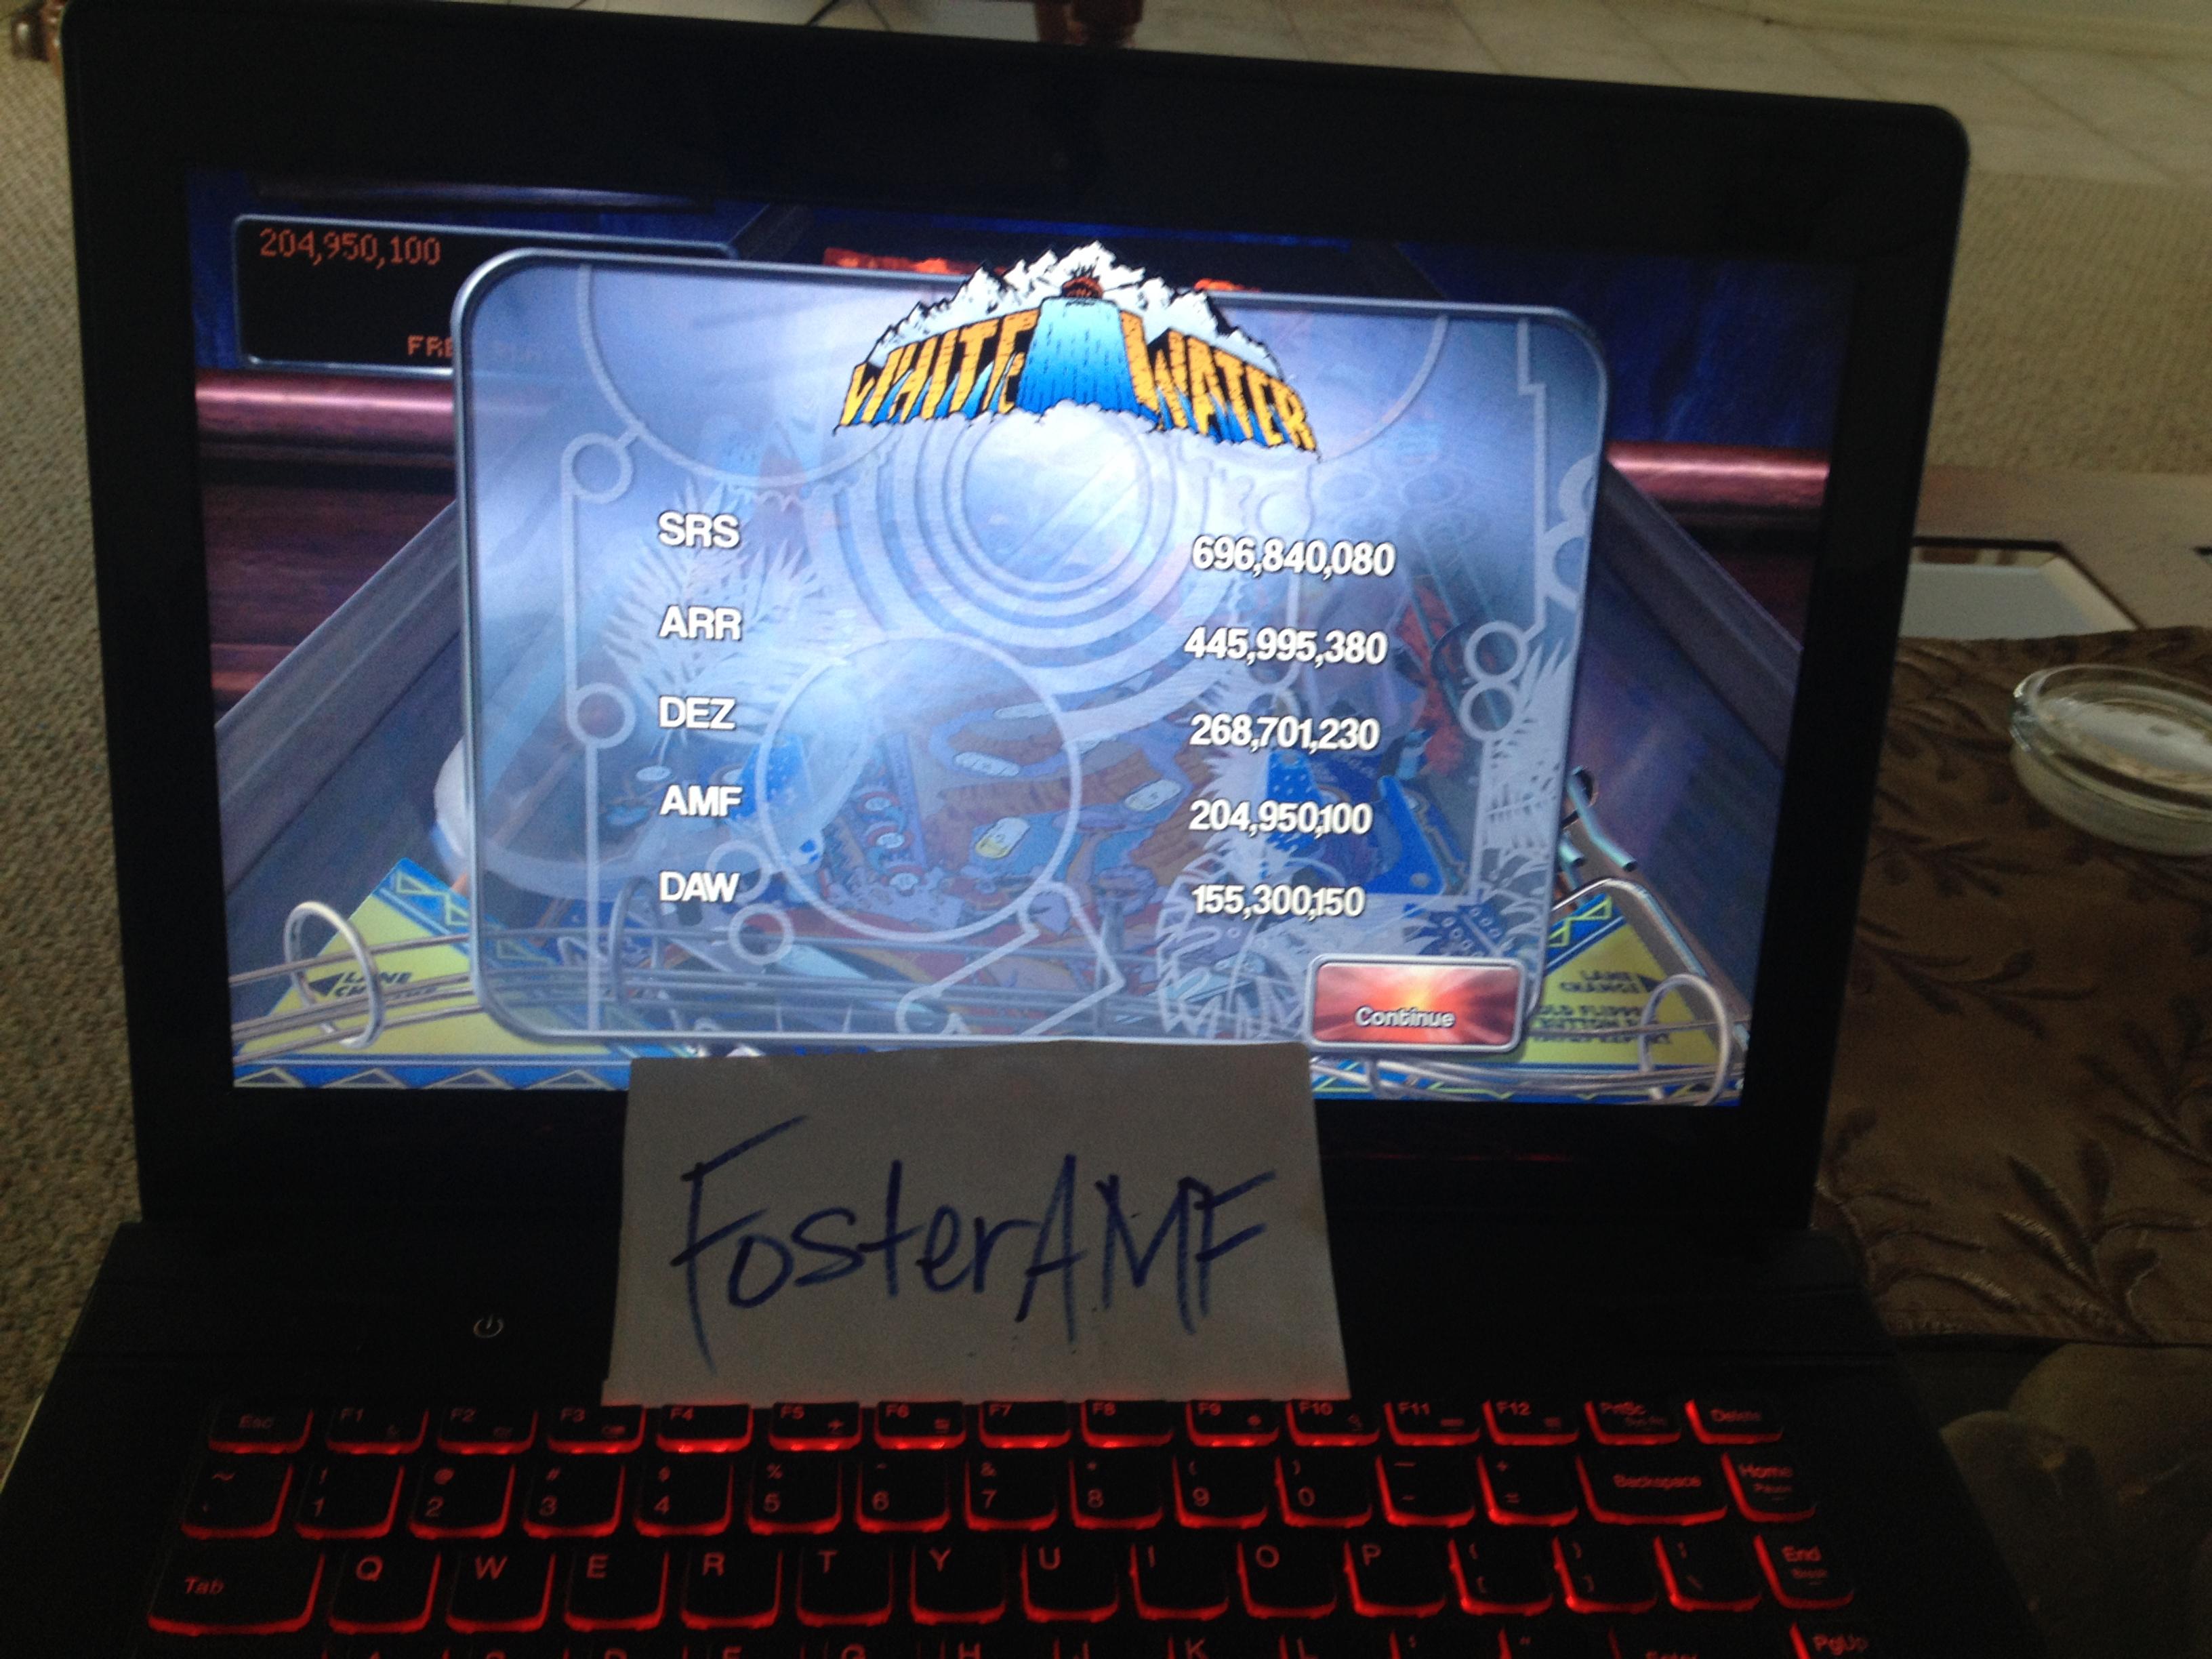 FosterAMF: Pinball Arcade: White Water (PC) 204,950,100 points on 2014-05-11 20:29:36